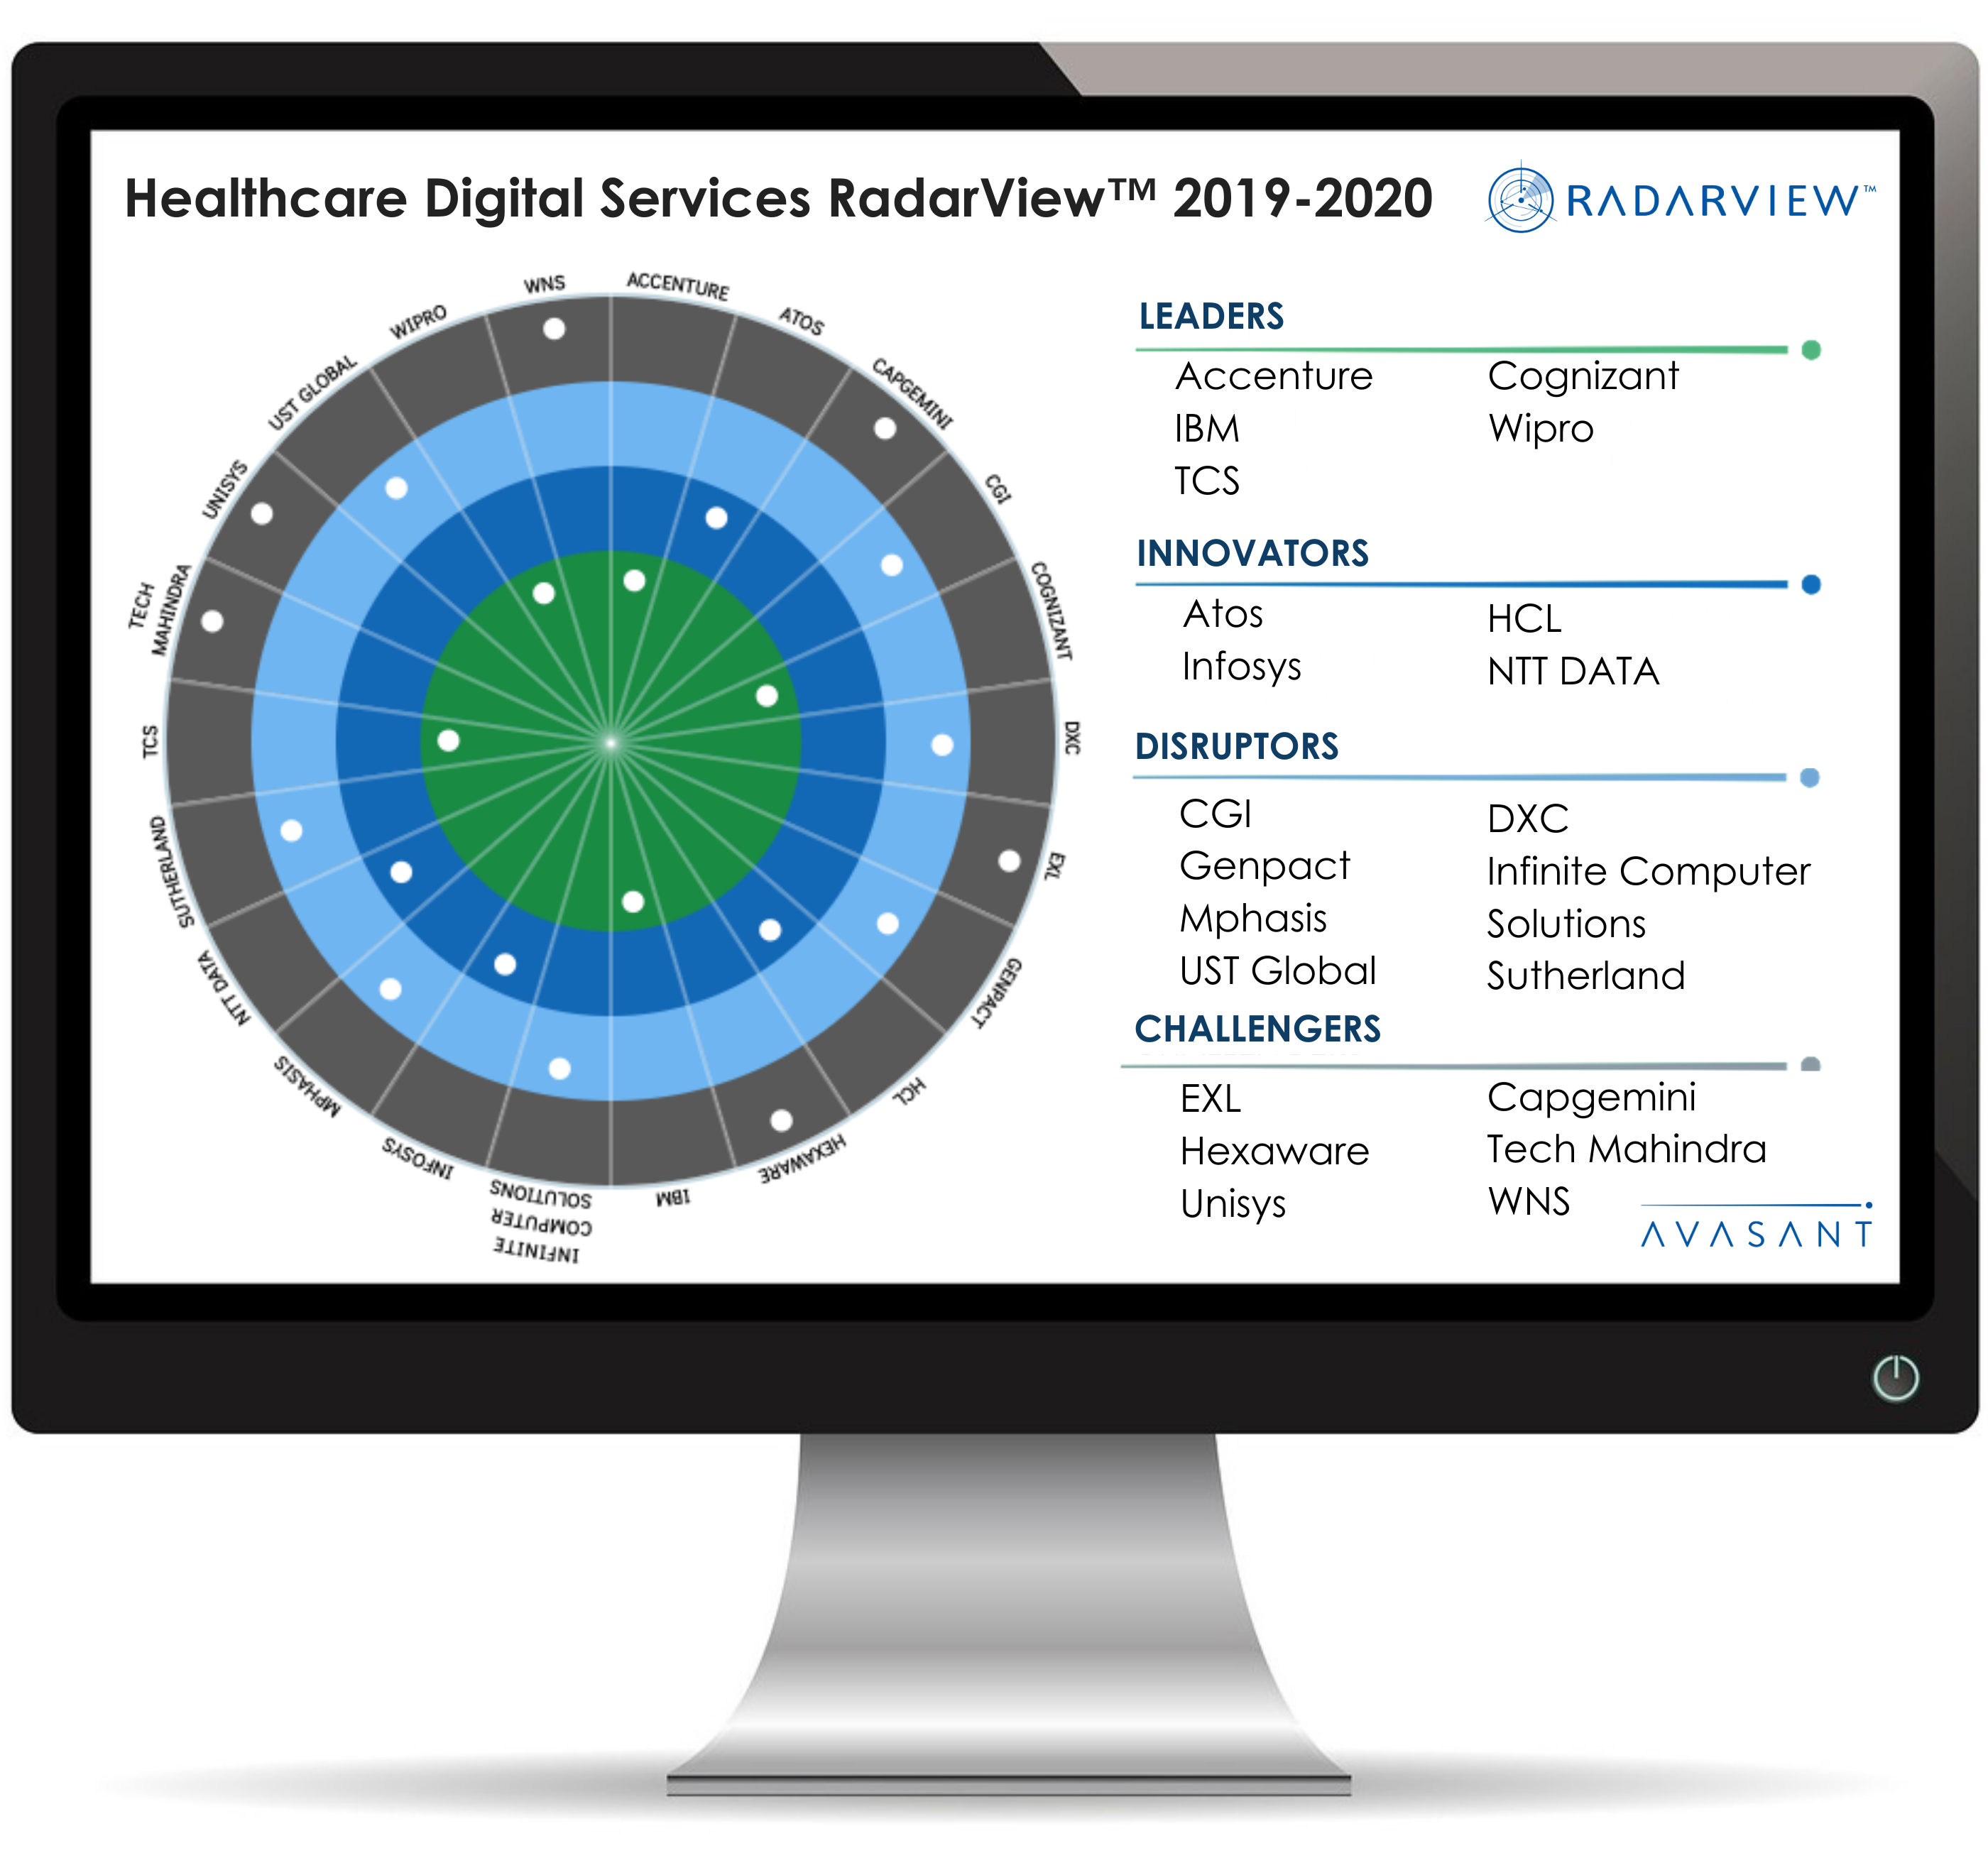 Healthcare RadarView Web Graphic 2 - Healthcare Digital Services RadarView™ 2019-2020 - Atos